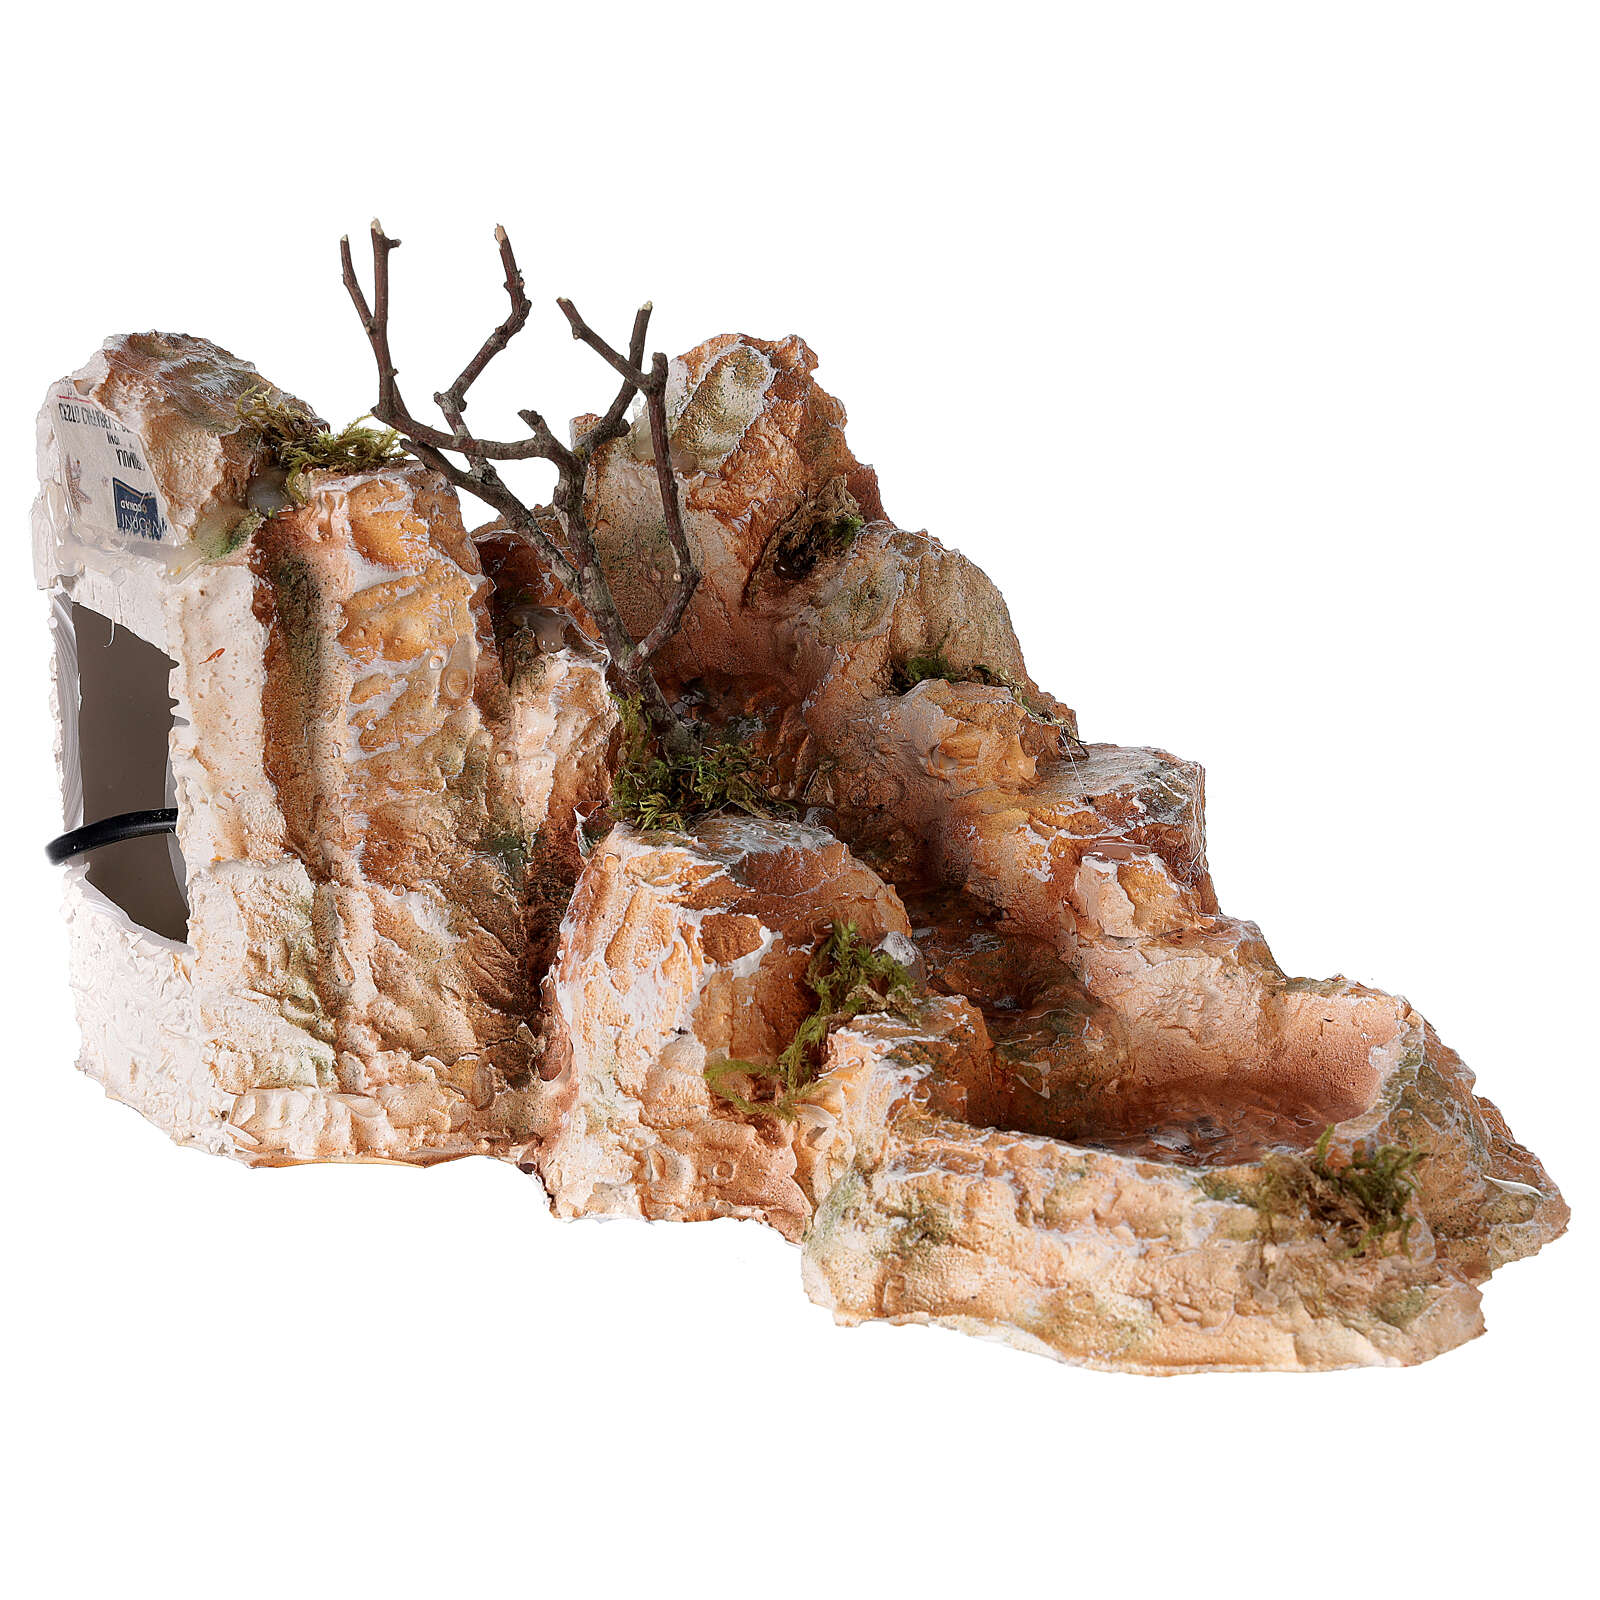 Stream figure resin Arab style 15x25x30 cm Neapolitan nativity 6-8 cm 4